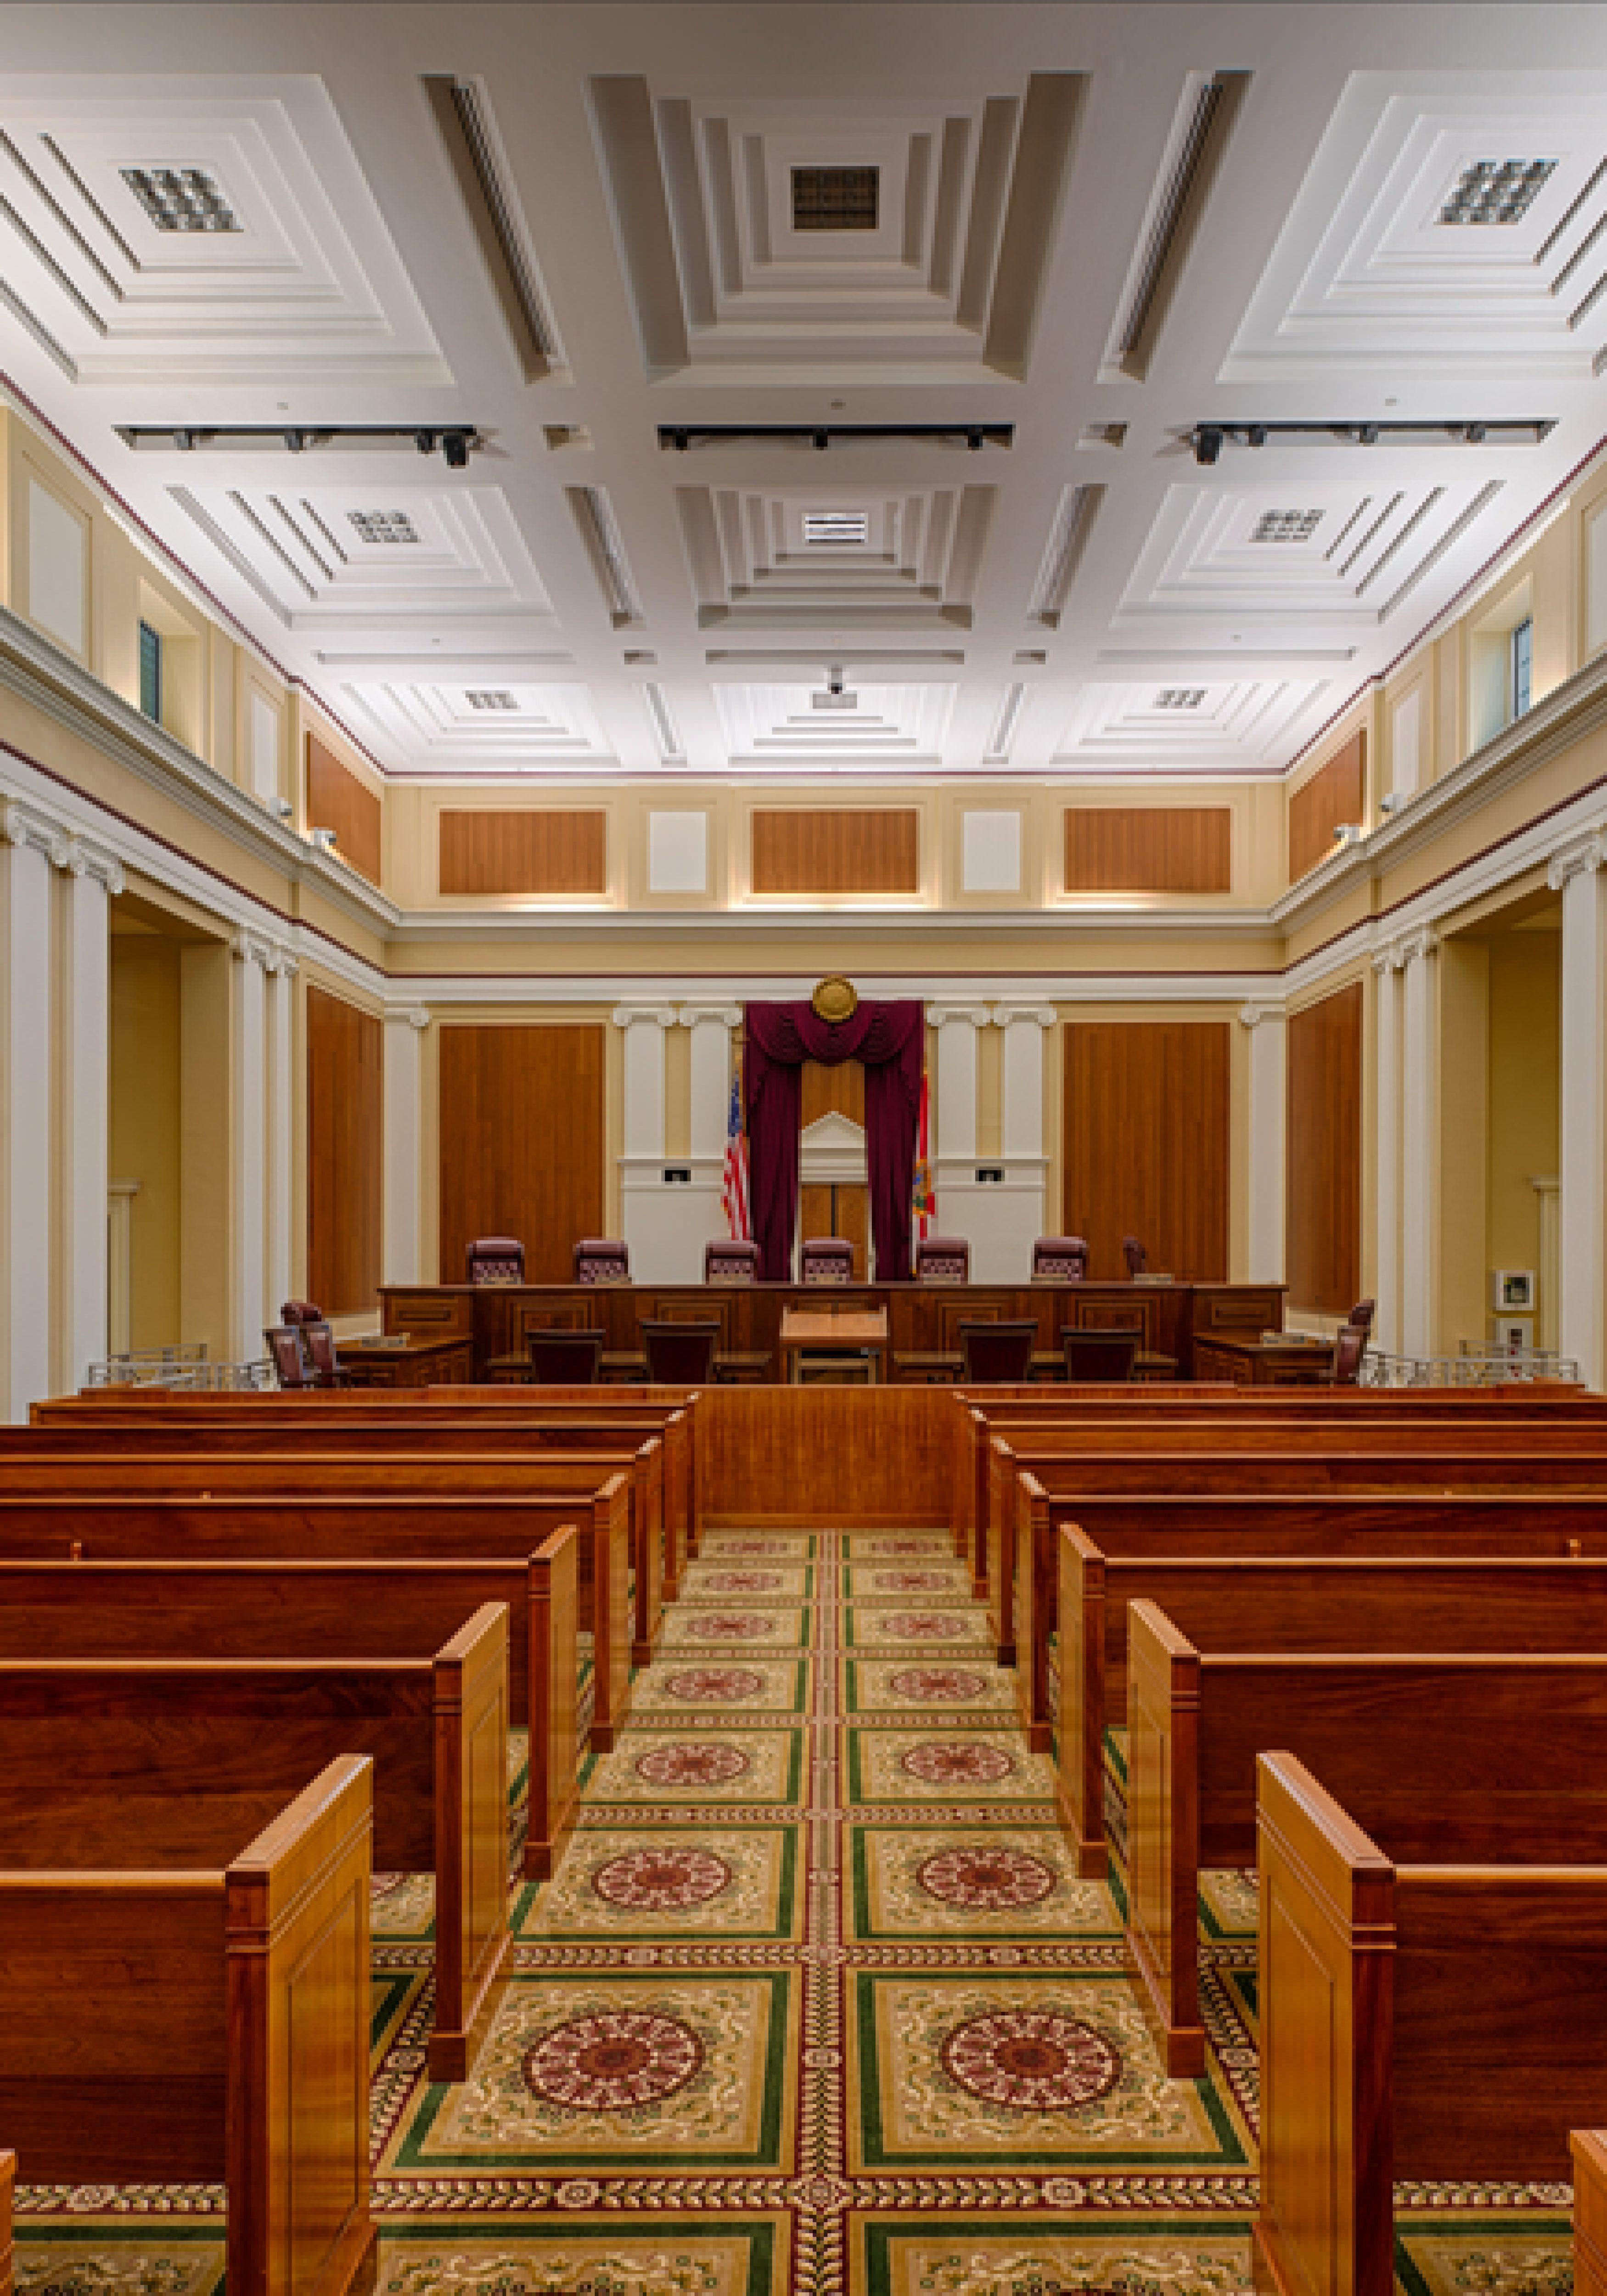 florida-supreme-court-inside-3500x5000.jpg